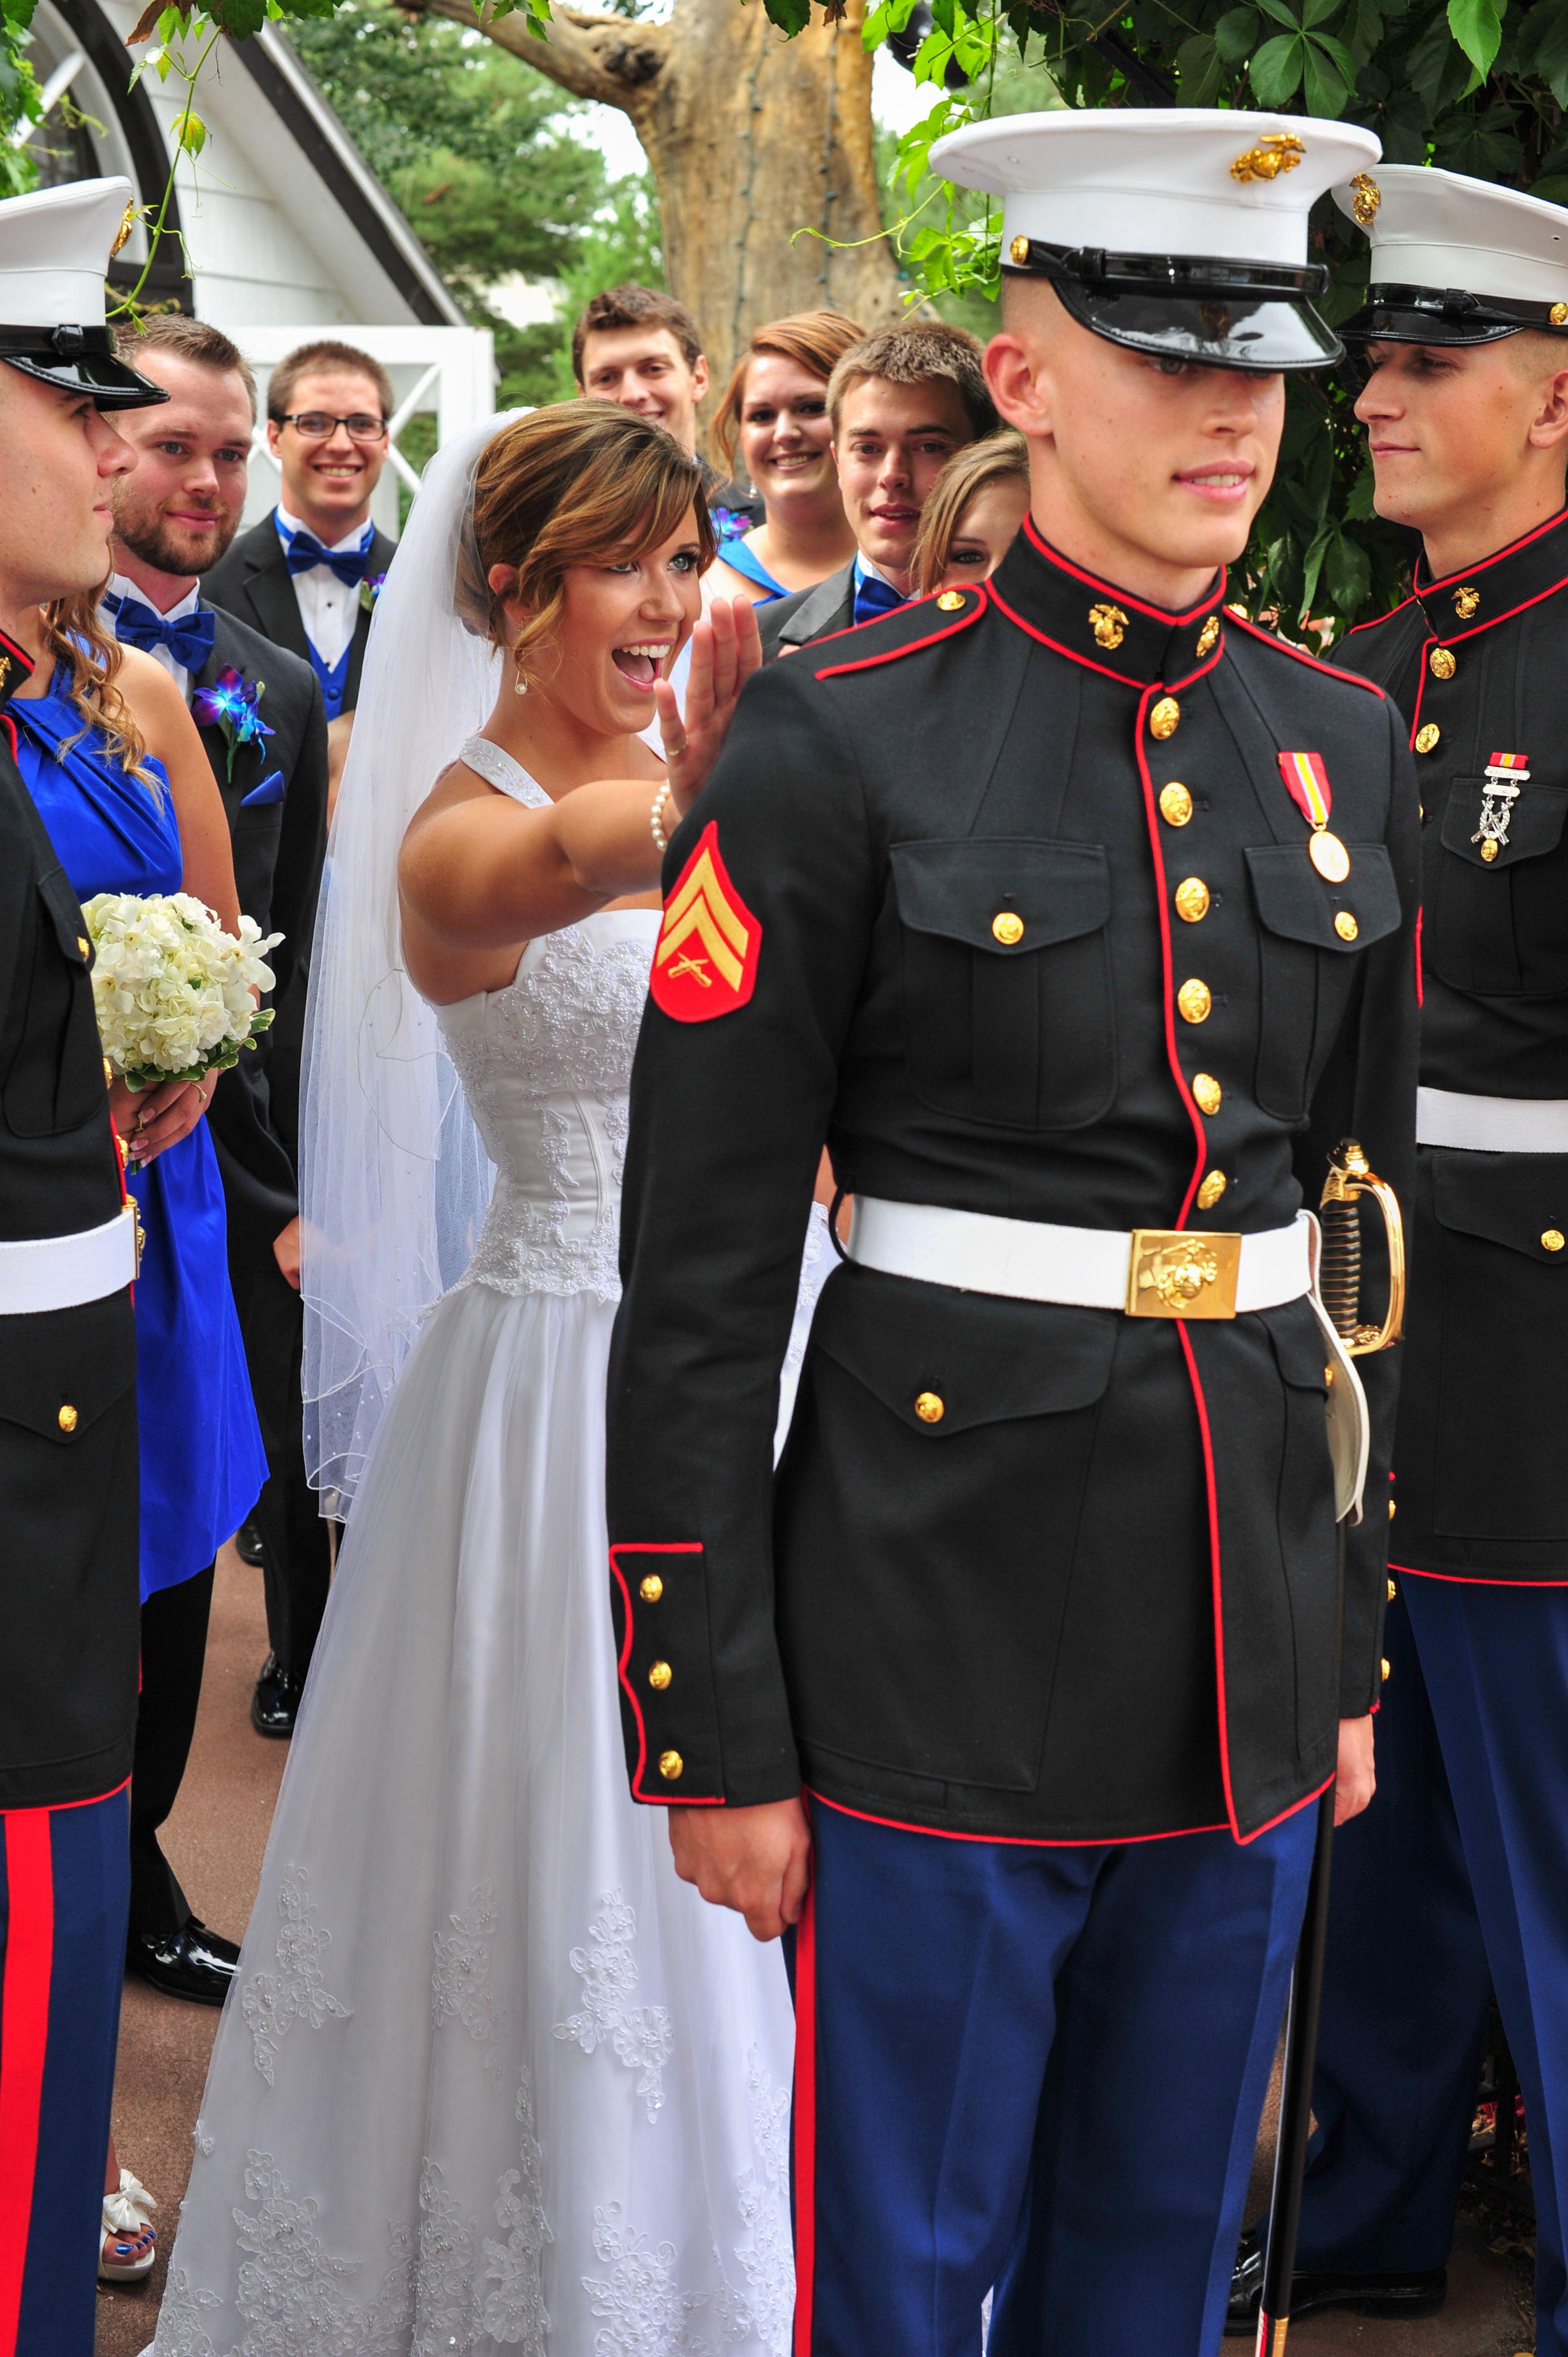 Pin By Lindsay Barlow On My Wedding Marine Corps Wedding Marine Wedding Military Wedding [ 4256 x 2832 Pixel ]